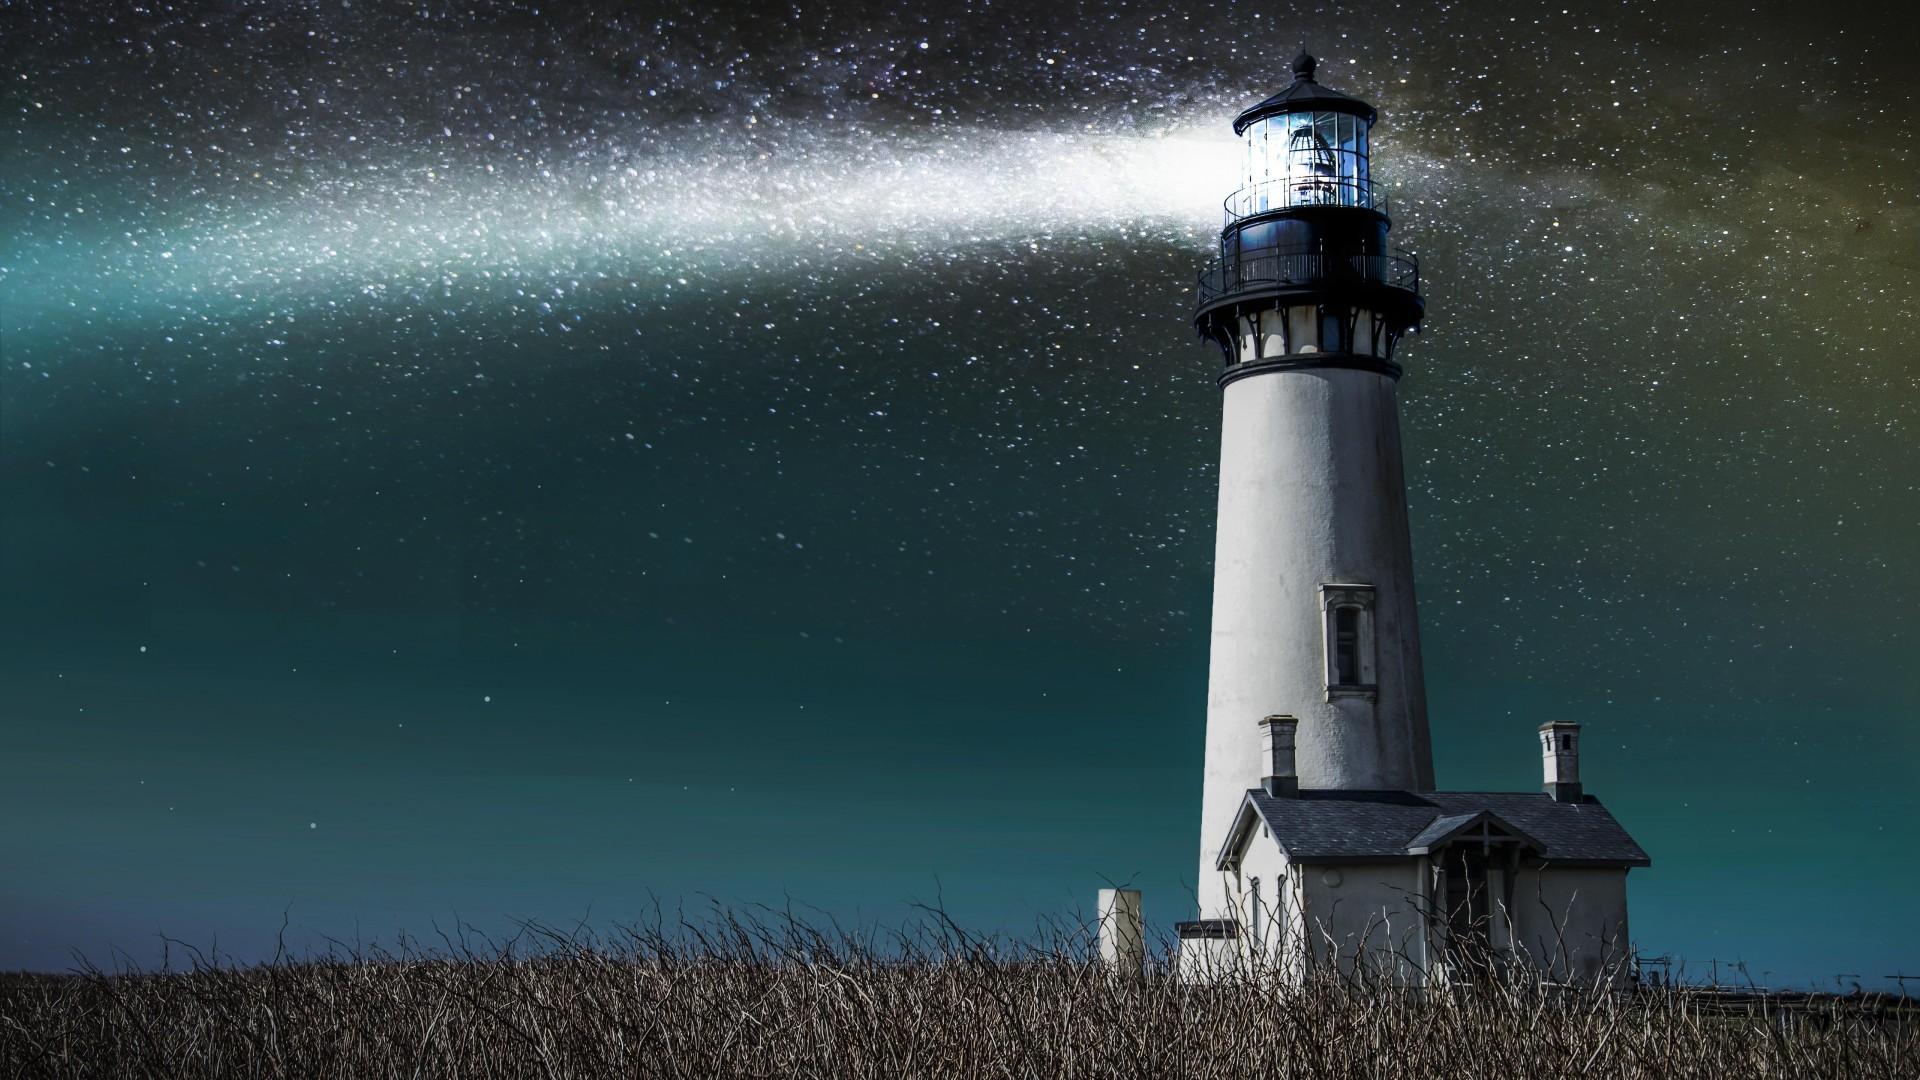 Wallpaper Lighthouse 5k 4k Wallpaper 8k Meadows Night